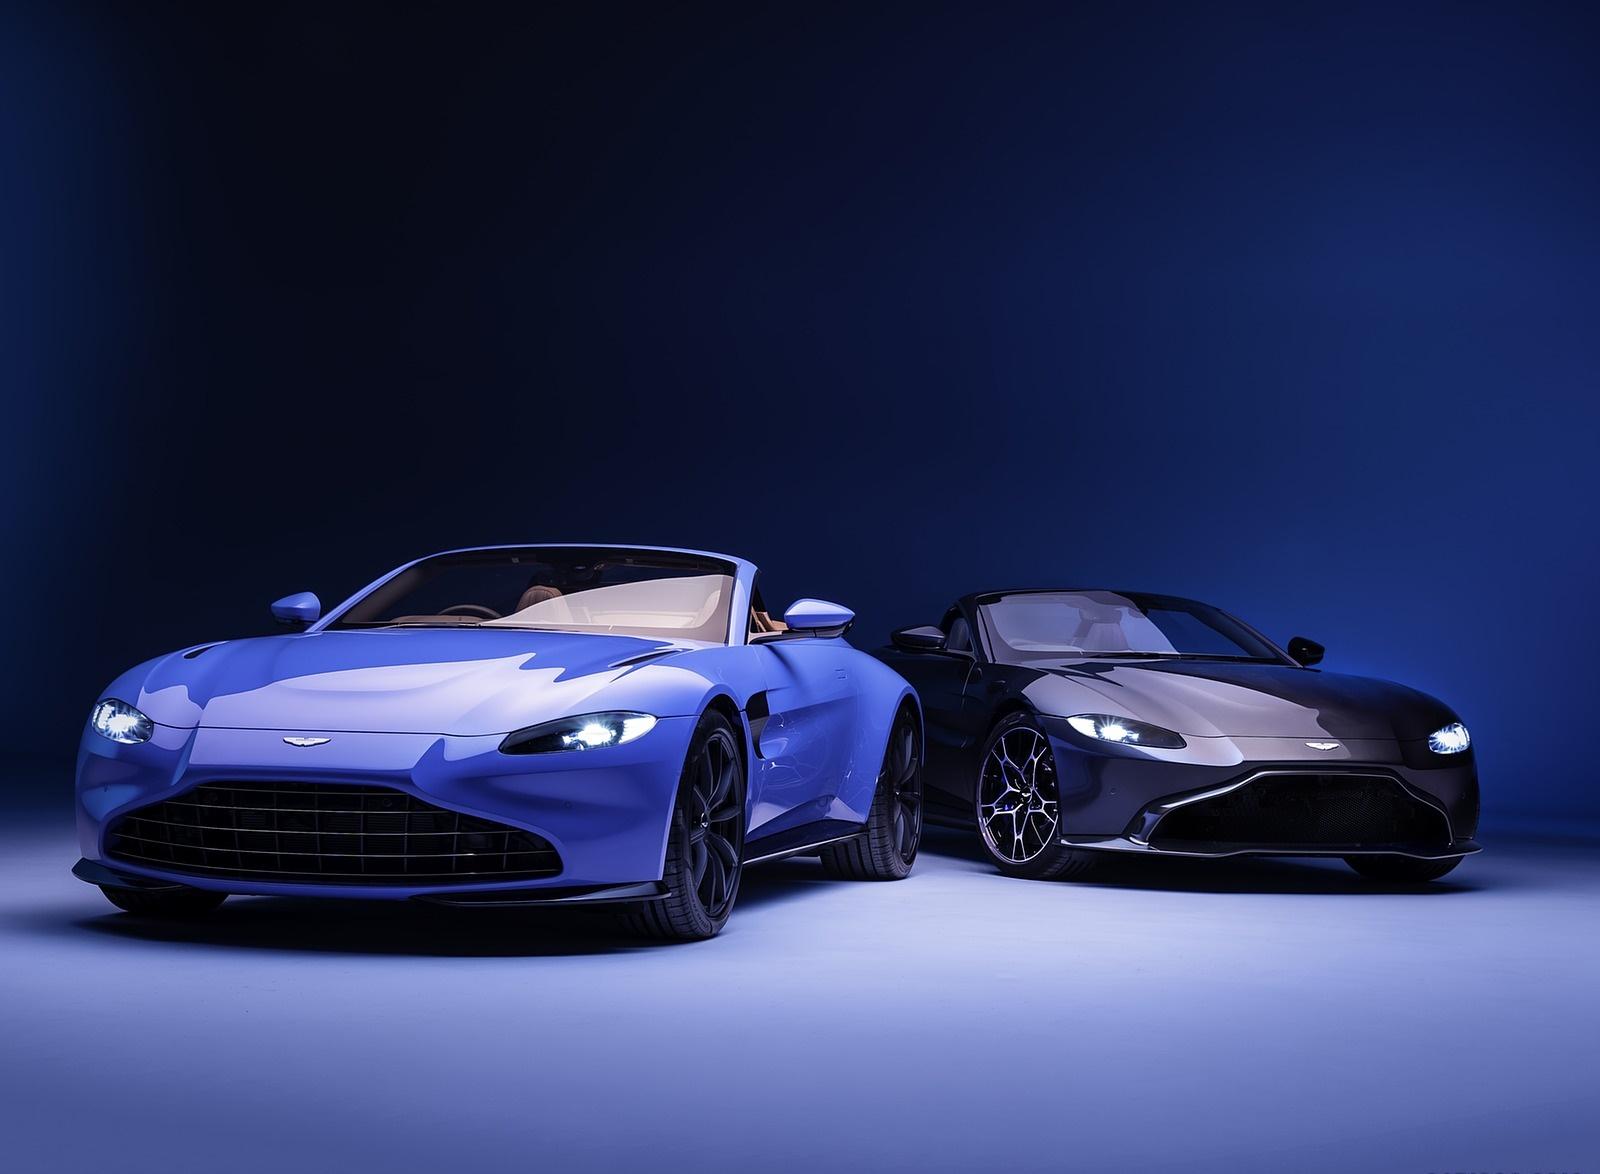 2021 Aston Martin Vantage Roadster Wallpapers (7)